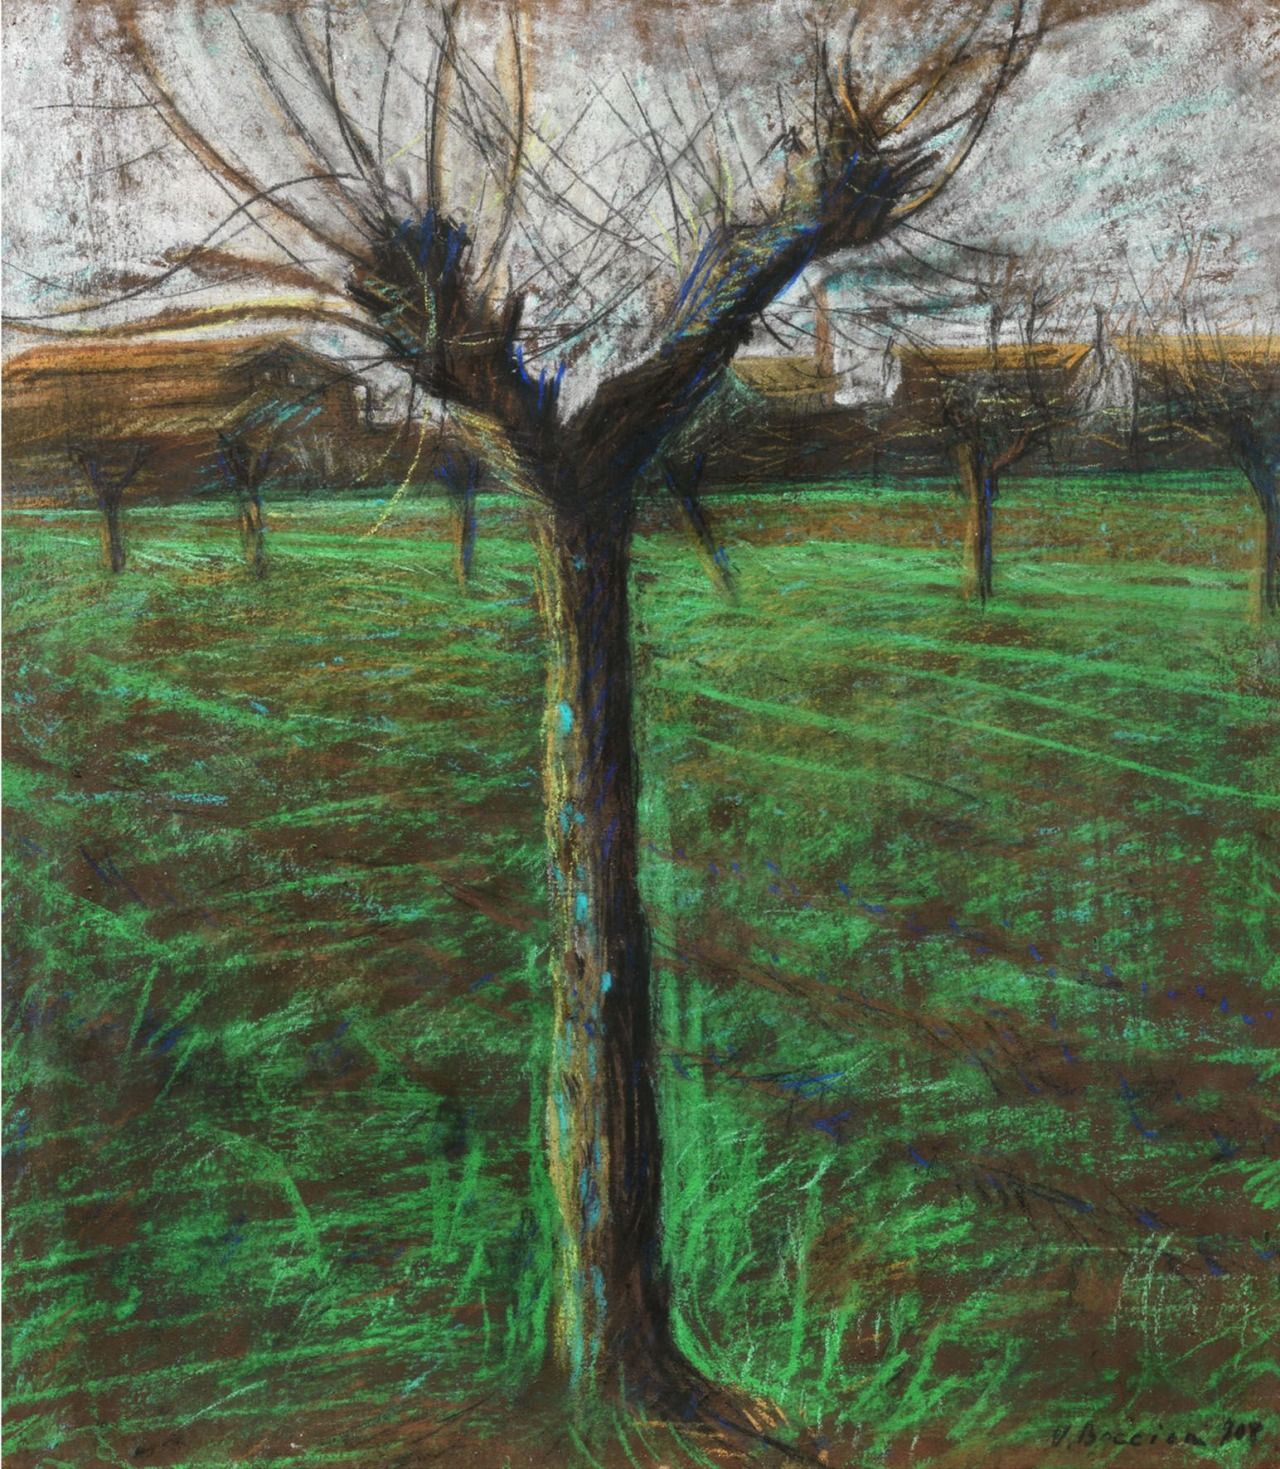 Umberto Boccioni (Italian, 1882 – 1916) Landscape with tree, 1908